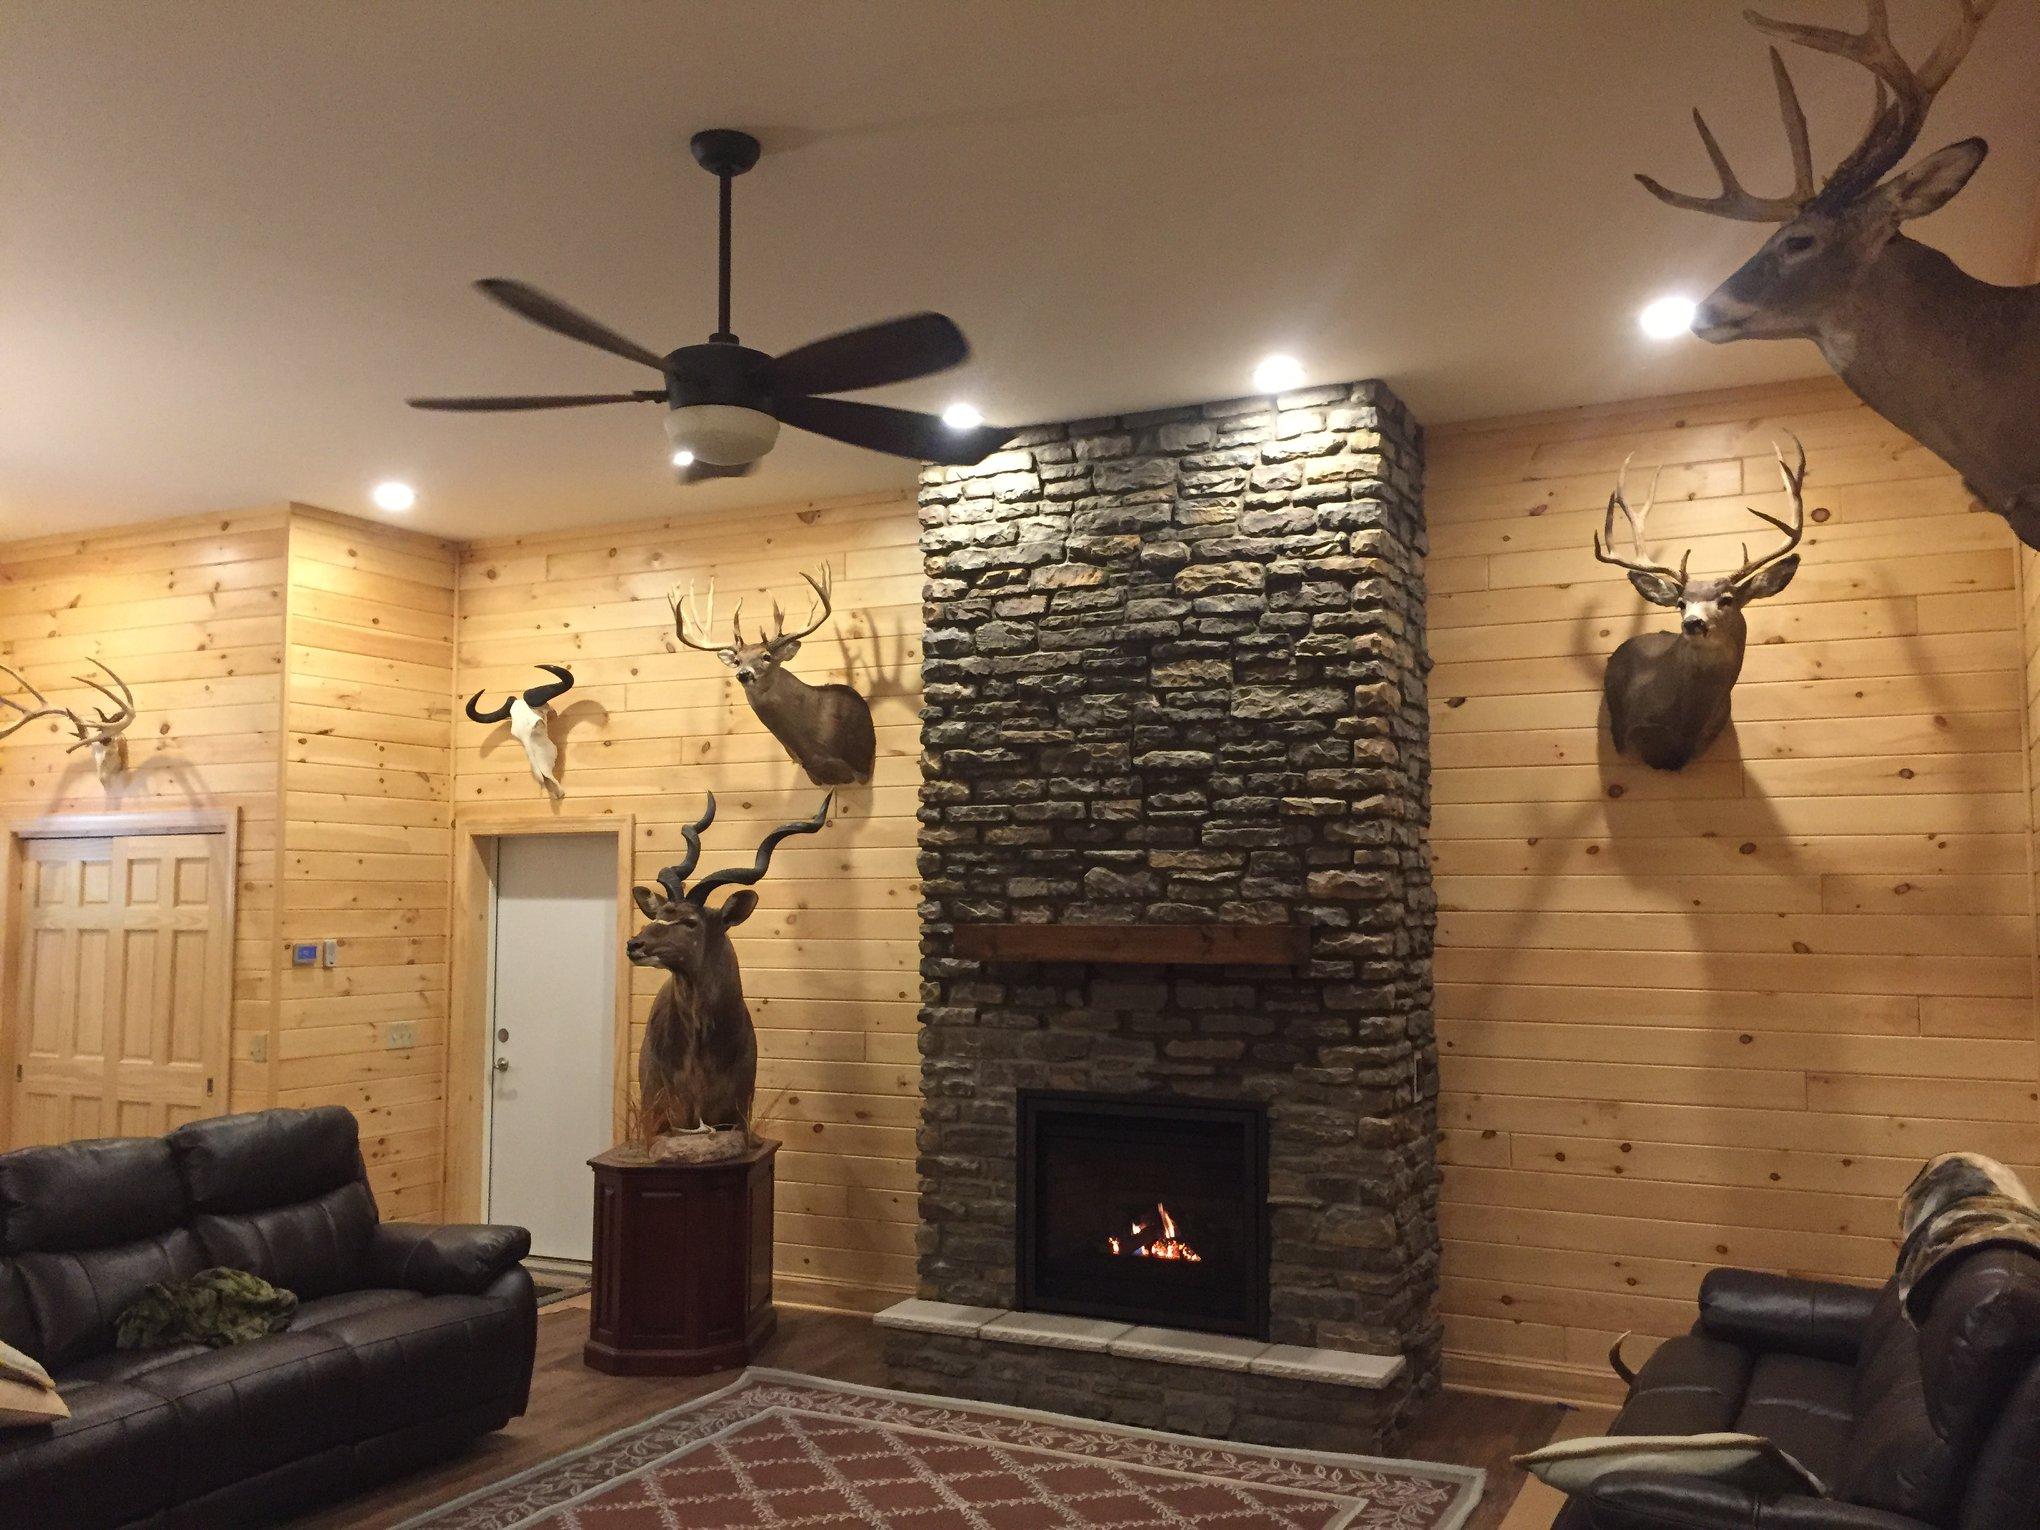 Regency P36 direct vent, propane, fireplace, stonework, hearth and mantel shelf.